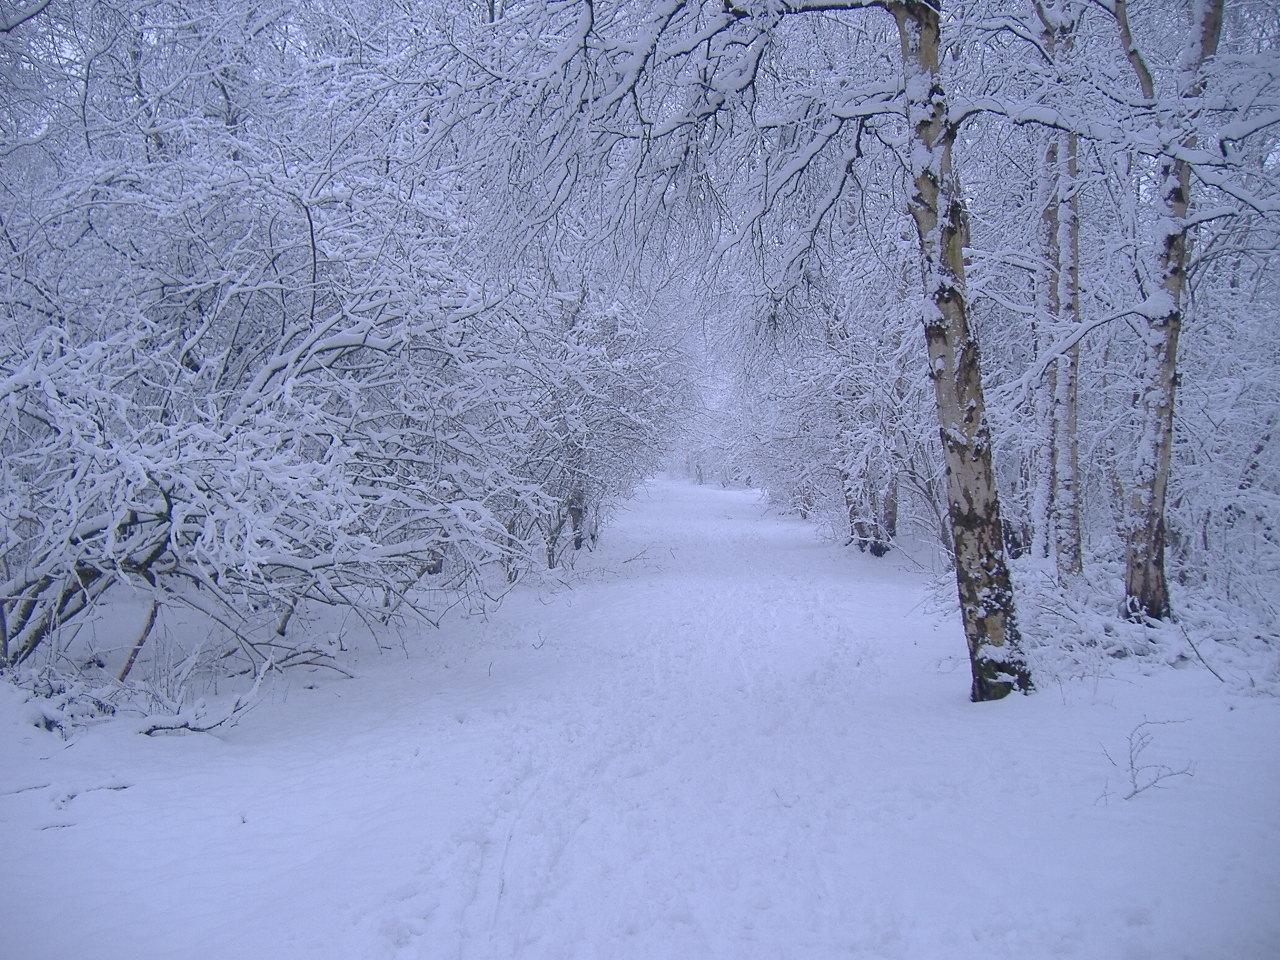 Download Winter Scene wallpaper Winter scene 28 1280x960